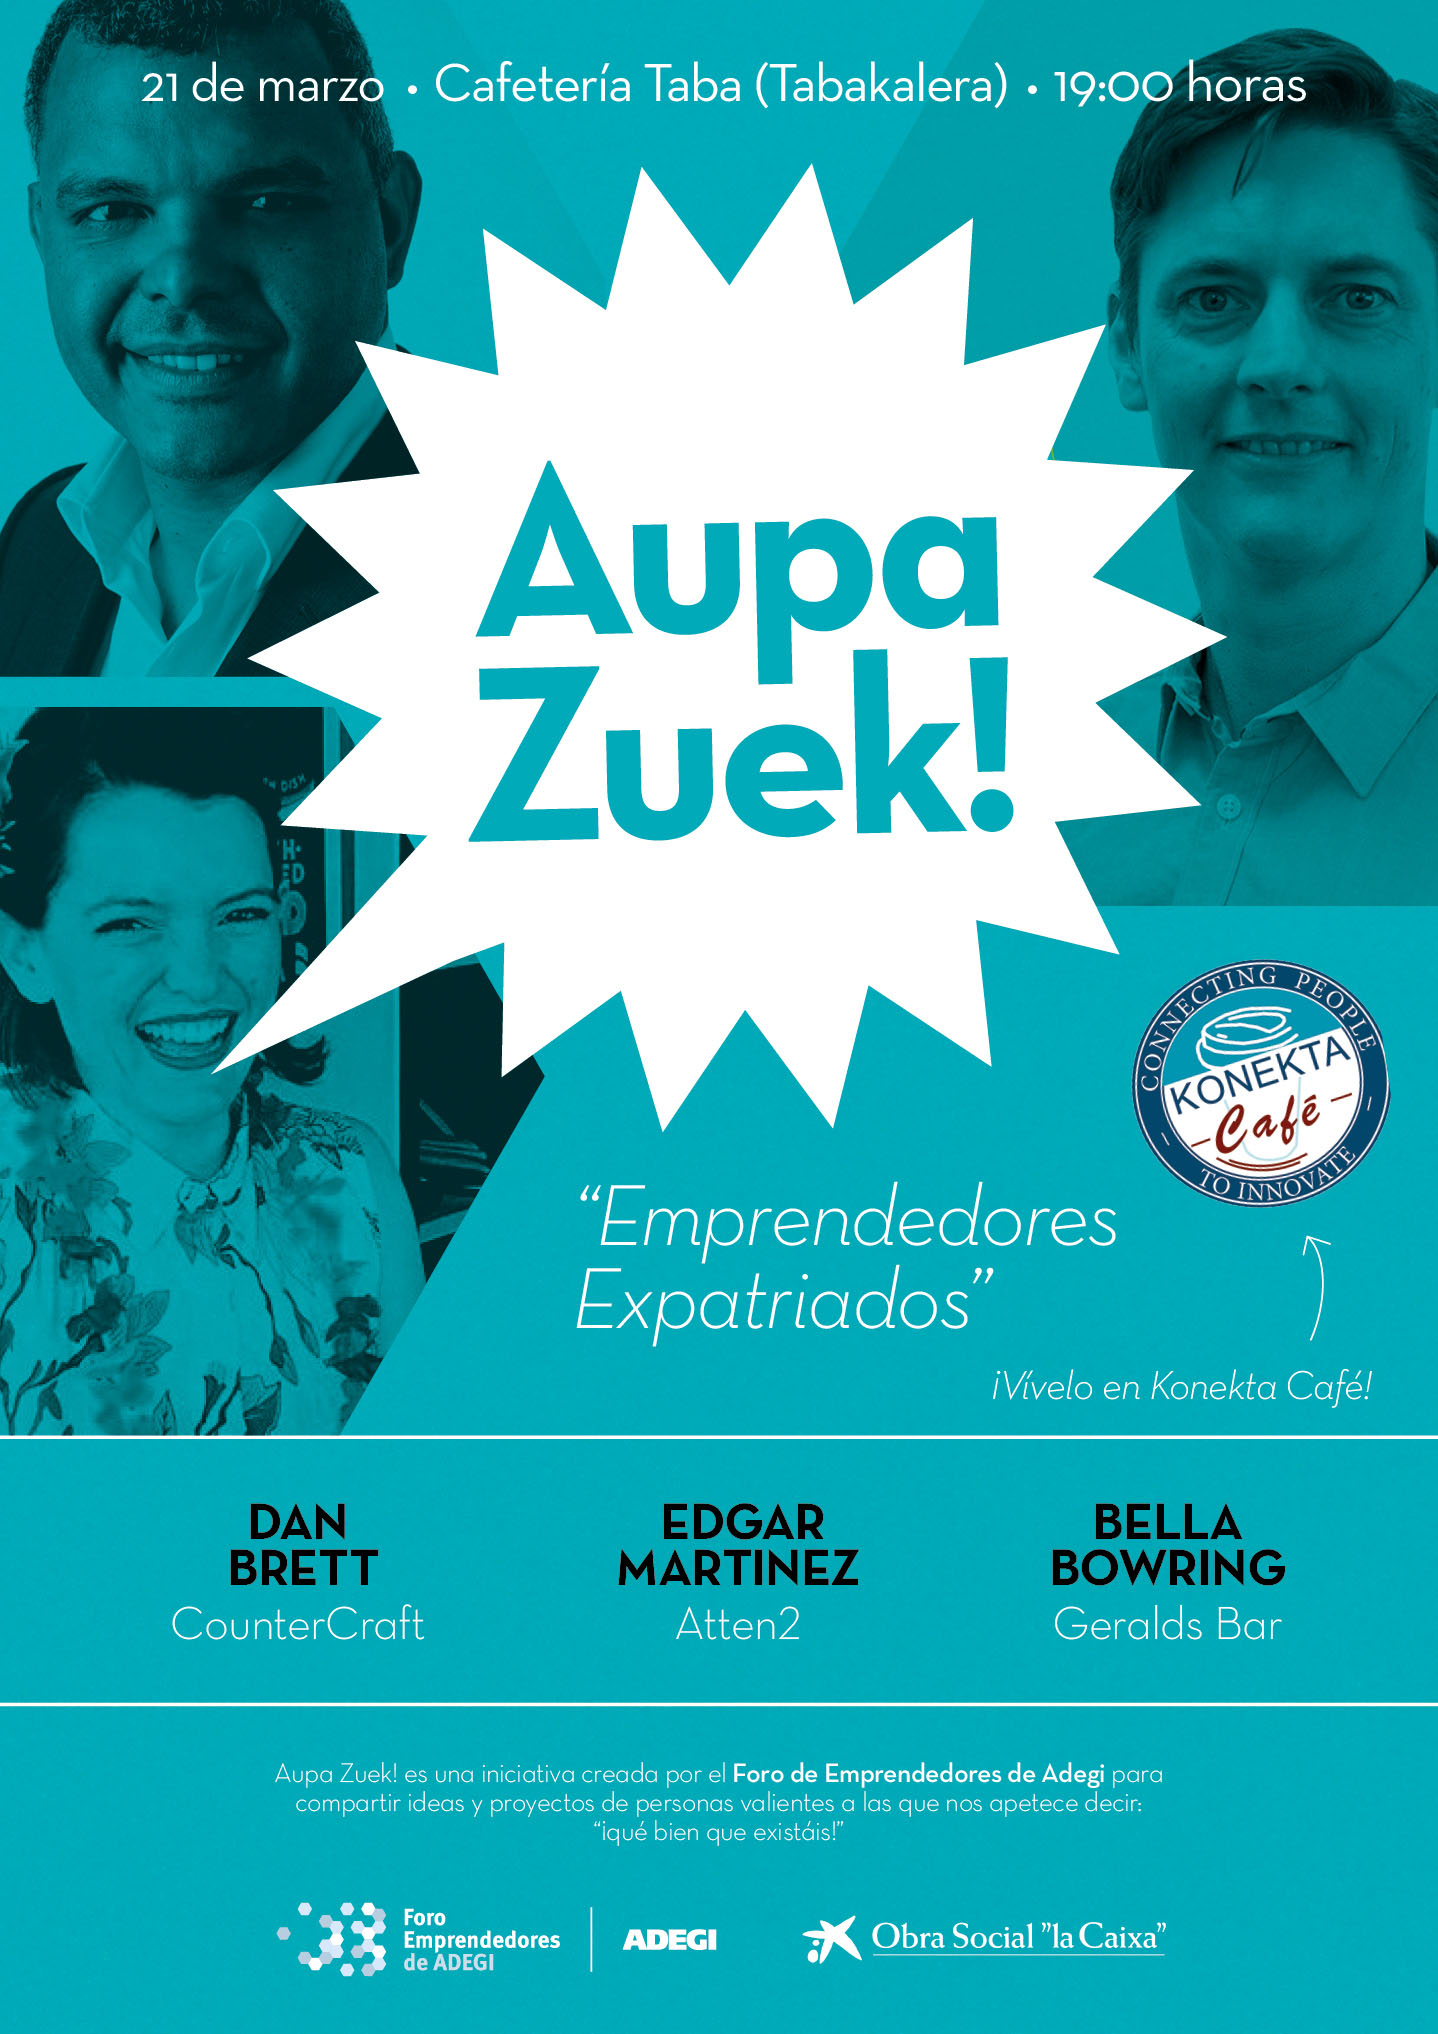 Aupa Zuek: Emprendedores ExPatriados